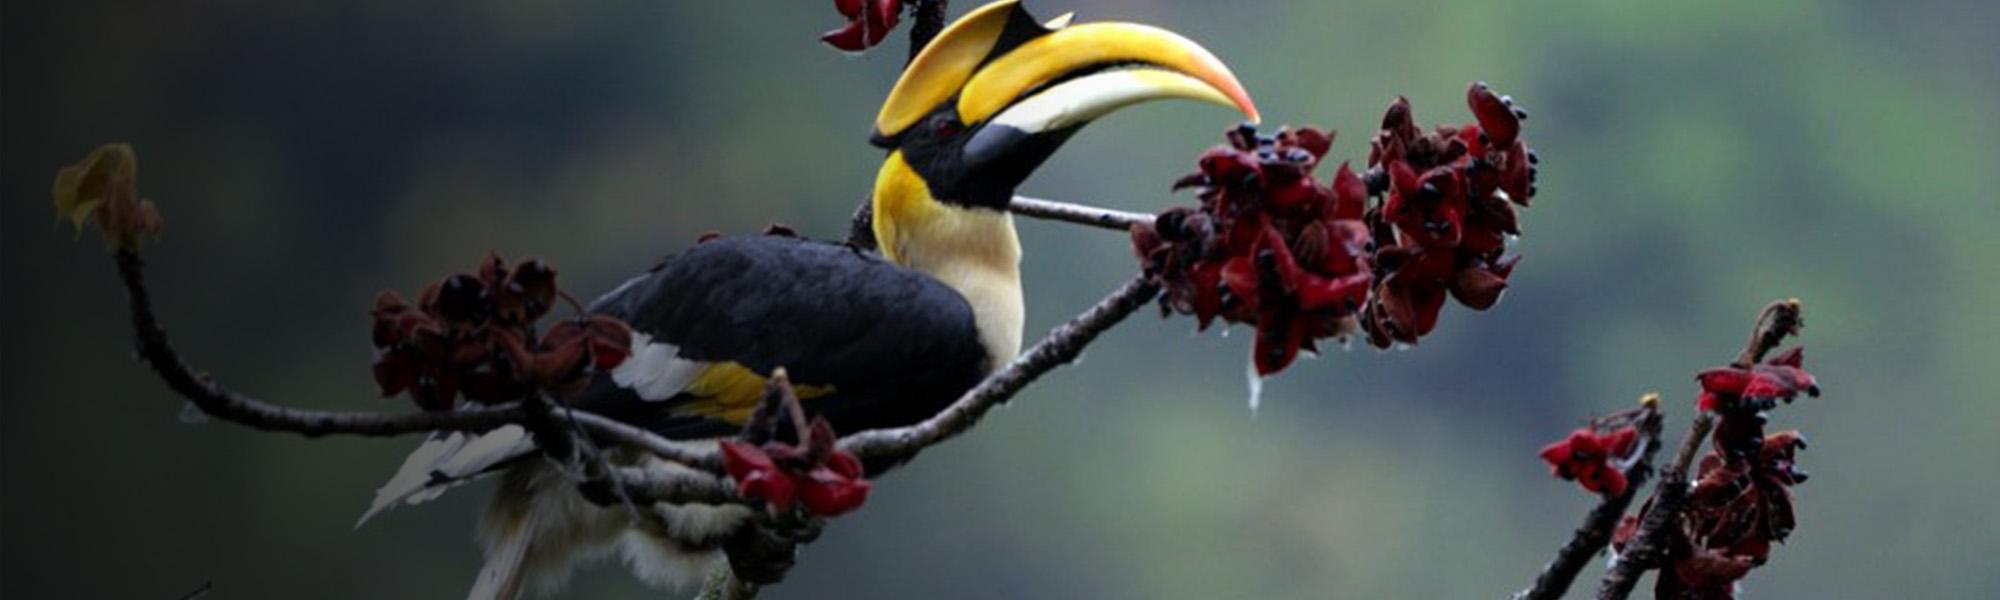 Bhutan Birdwatching Tour